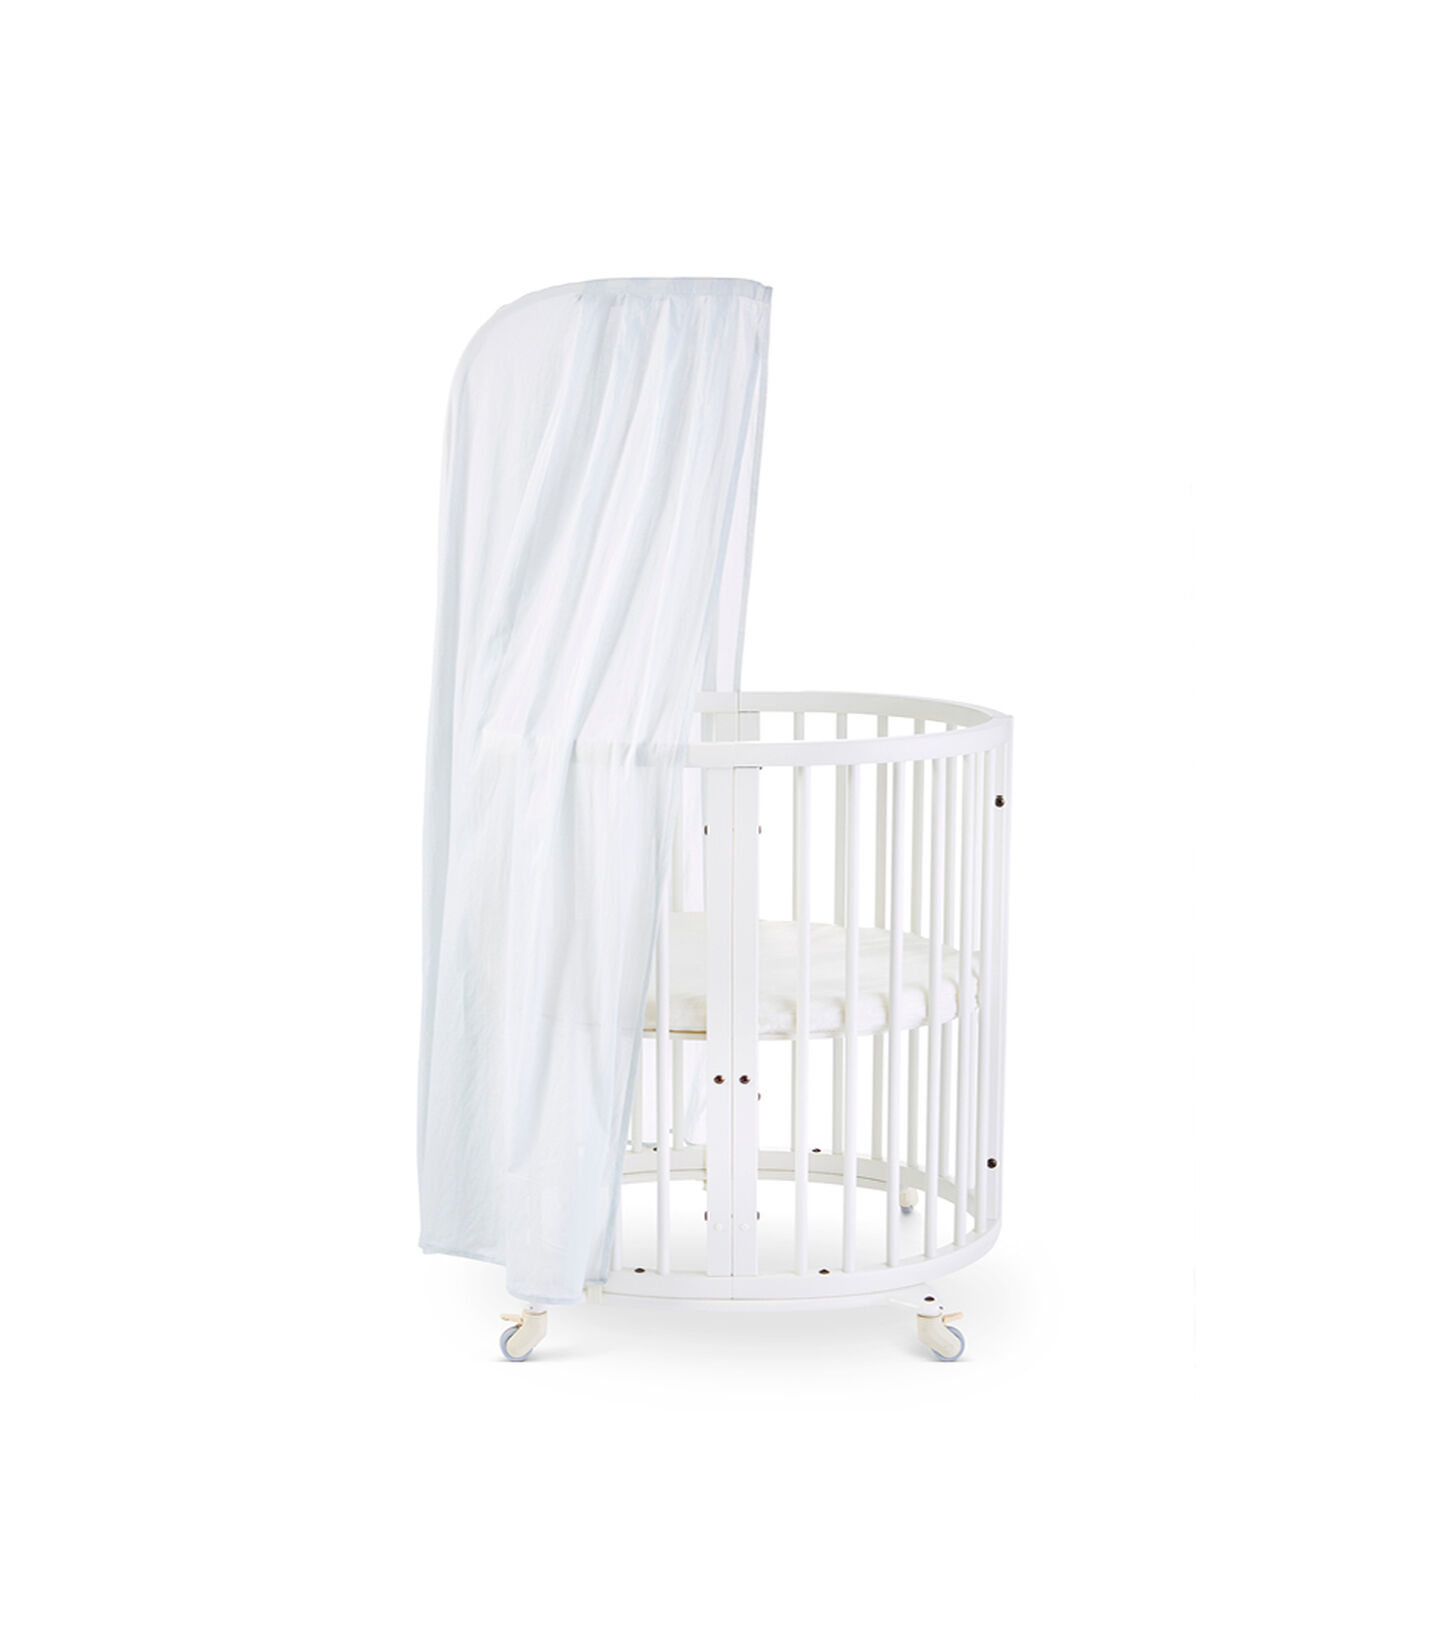 Stokke® Sleepi™ Mini, White. Canopy Pehr Mist. US only.